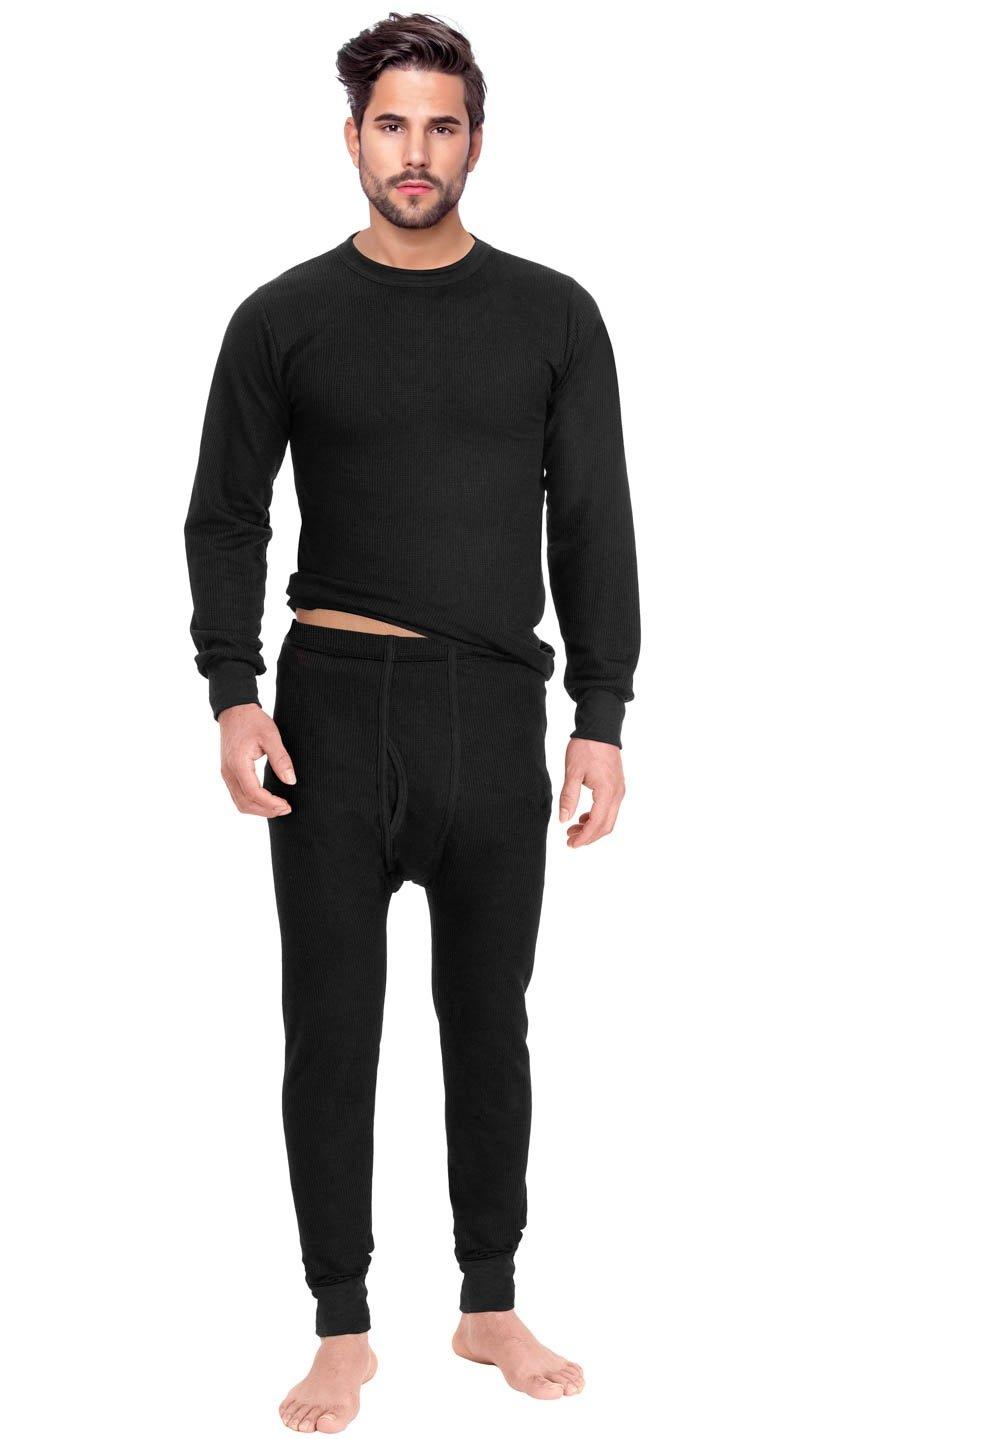 Rocky Men's Thermal 2pc Set Long John Underwear Medium Black